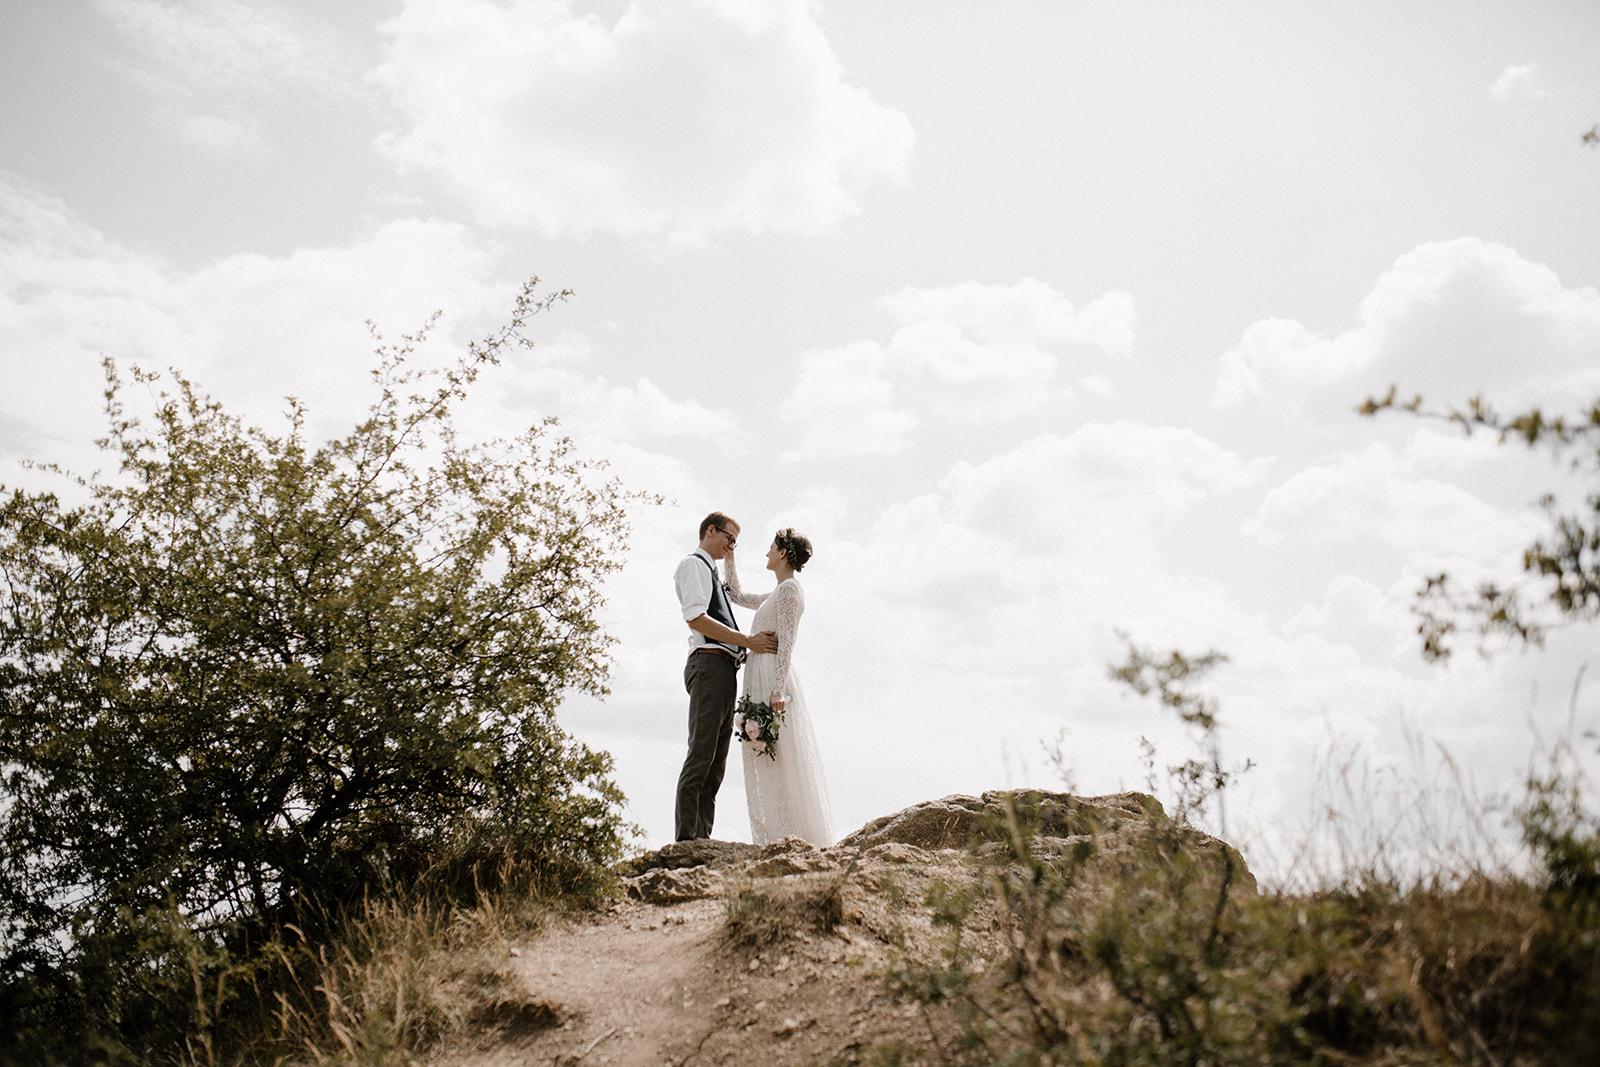 Jaja_Josh_wedding-441.jpg